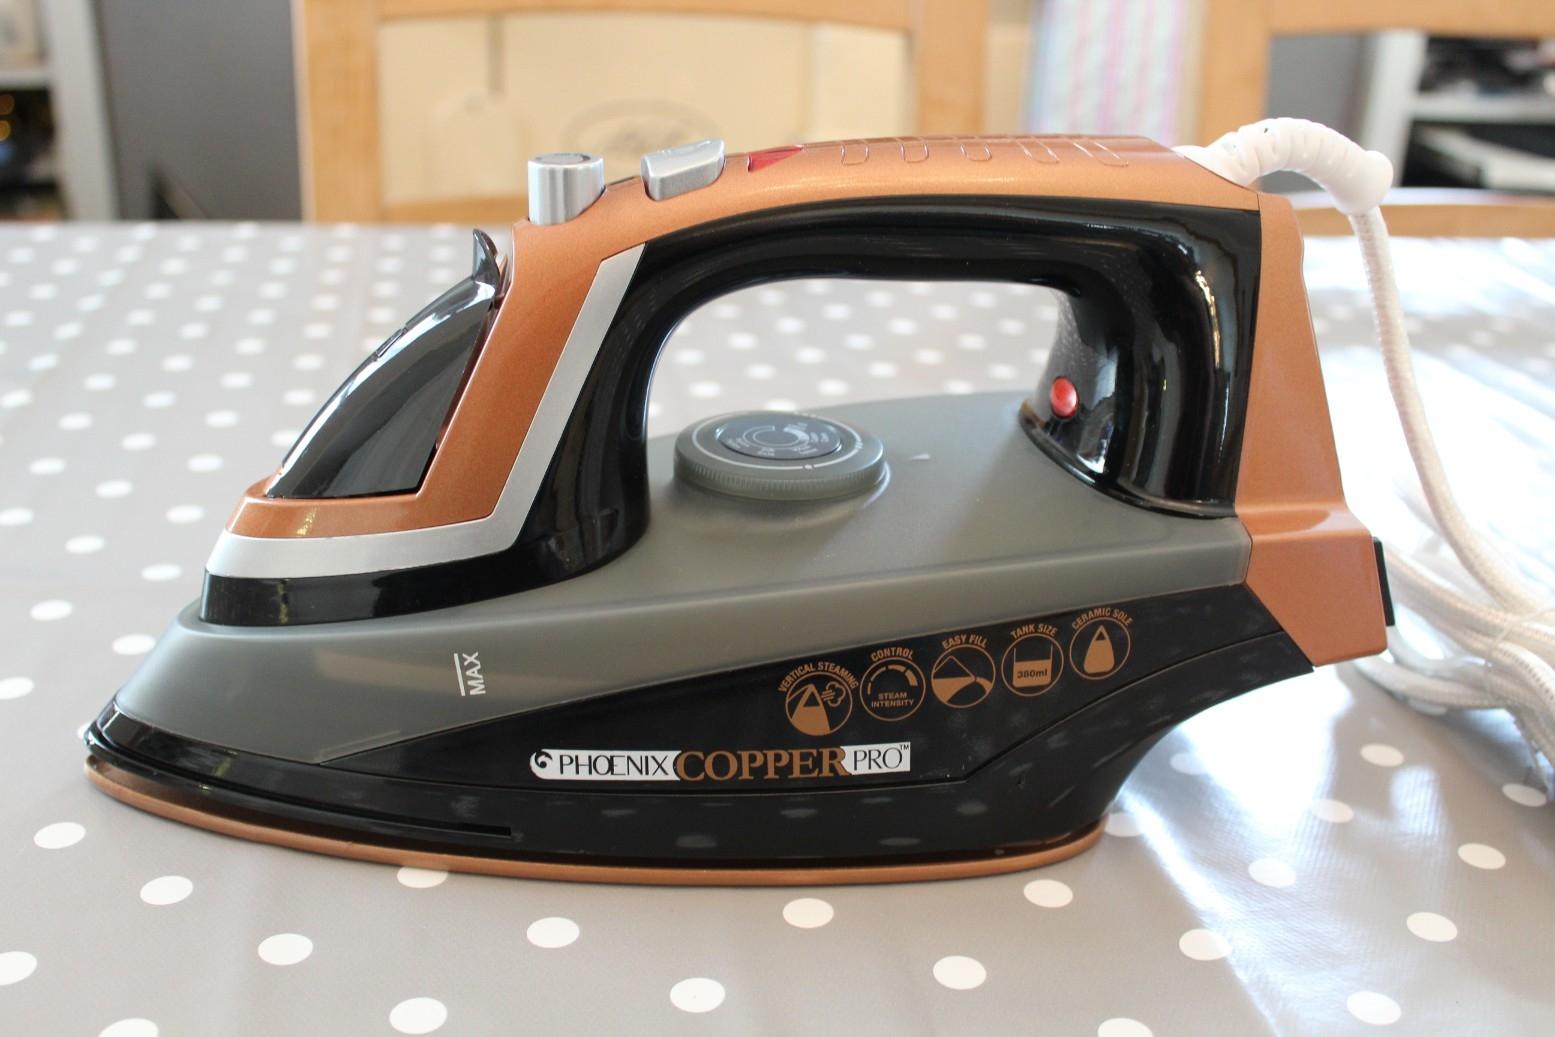 JML Phoenix Copper Iron Review (5)